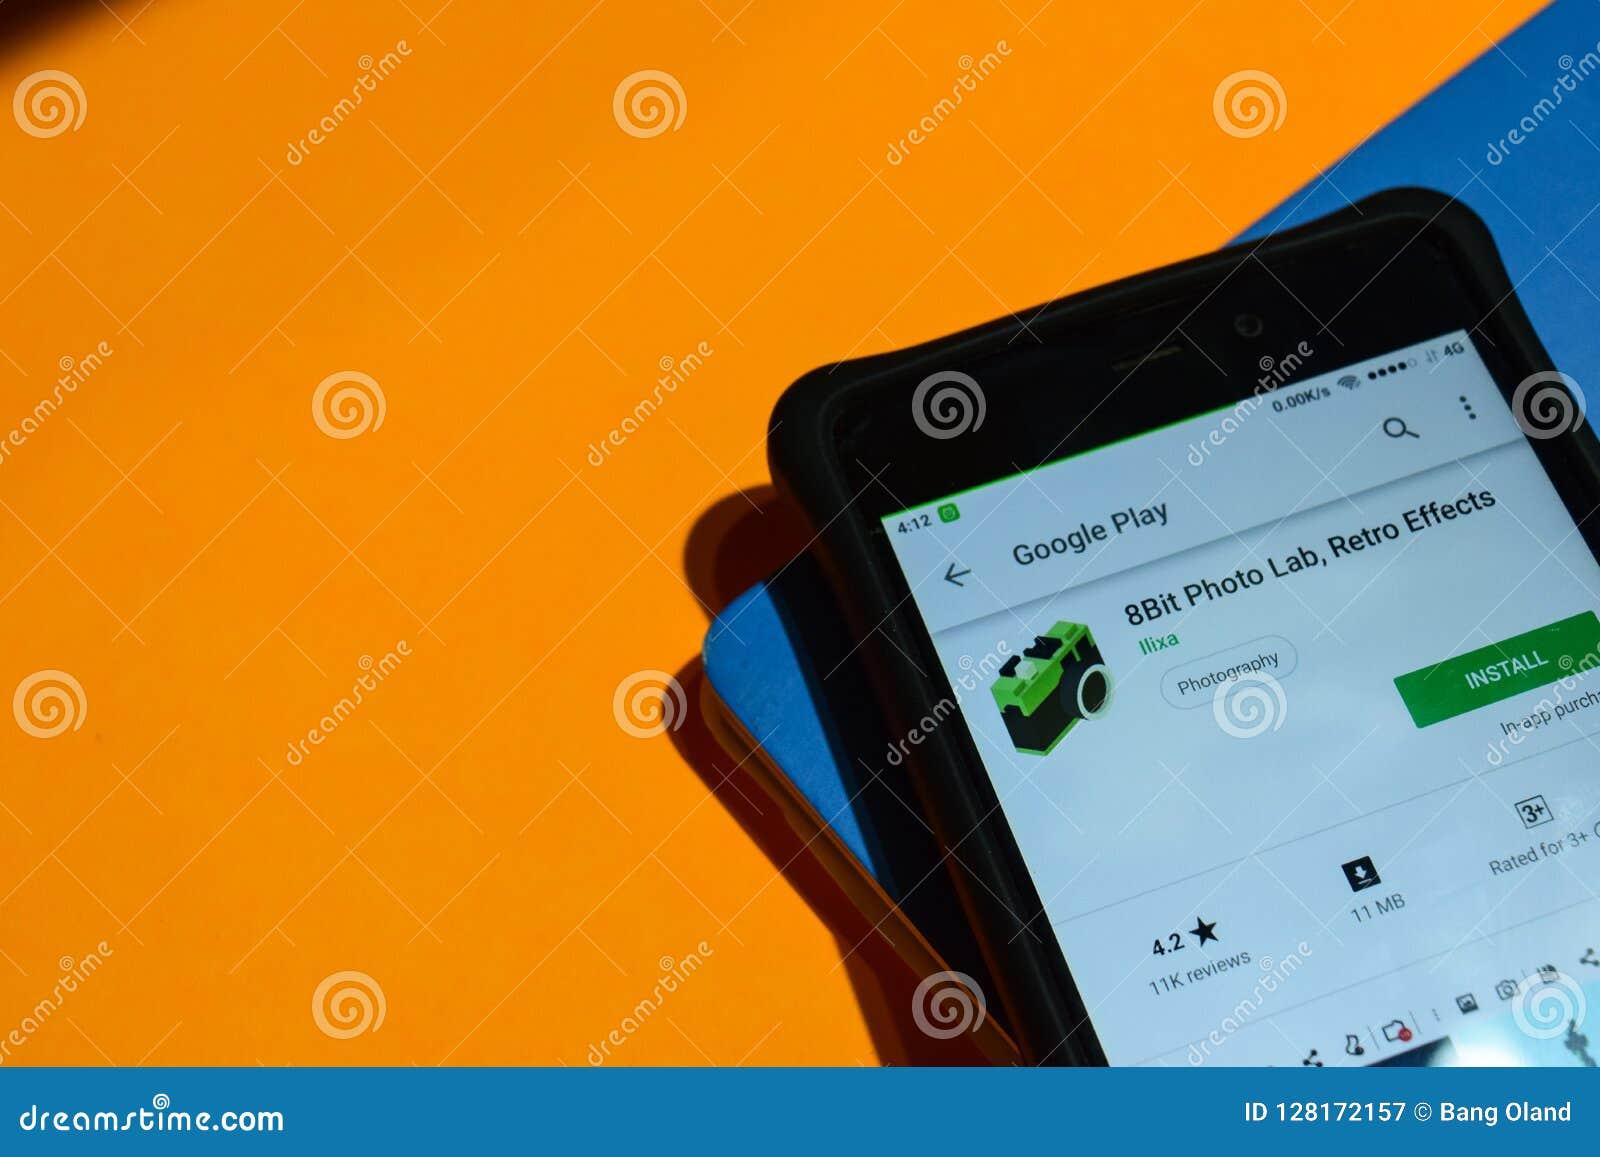 8bit Photo Lab, Retro Effects Dev App On Smartphone Screen